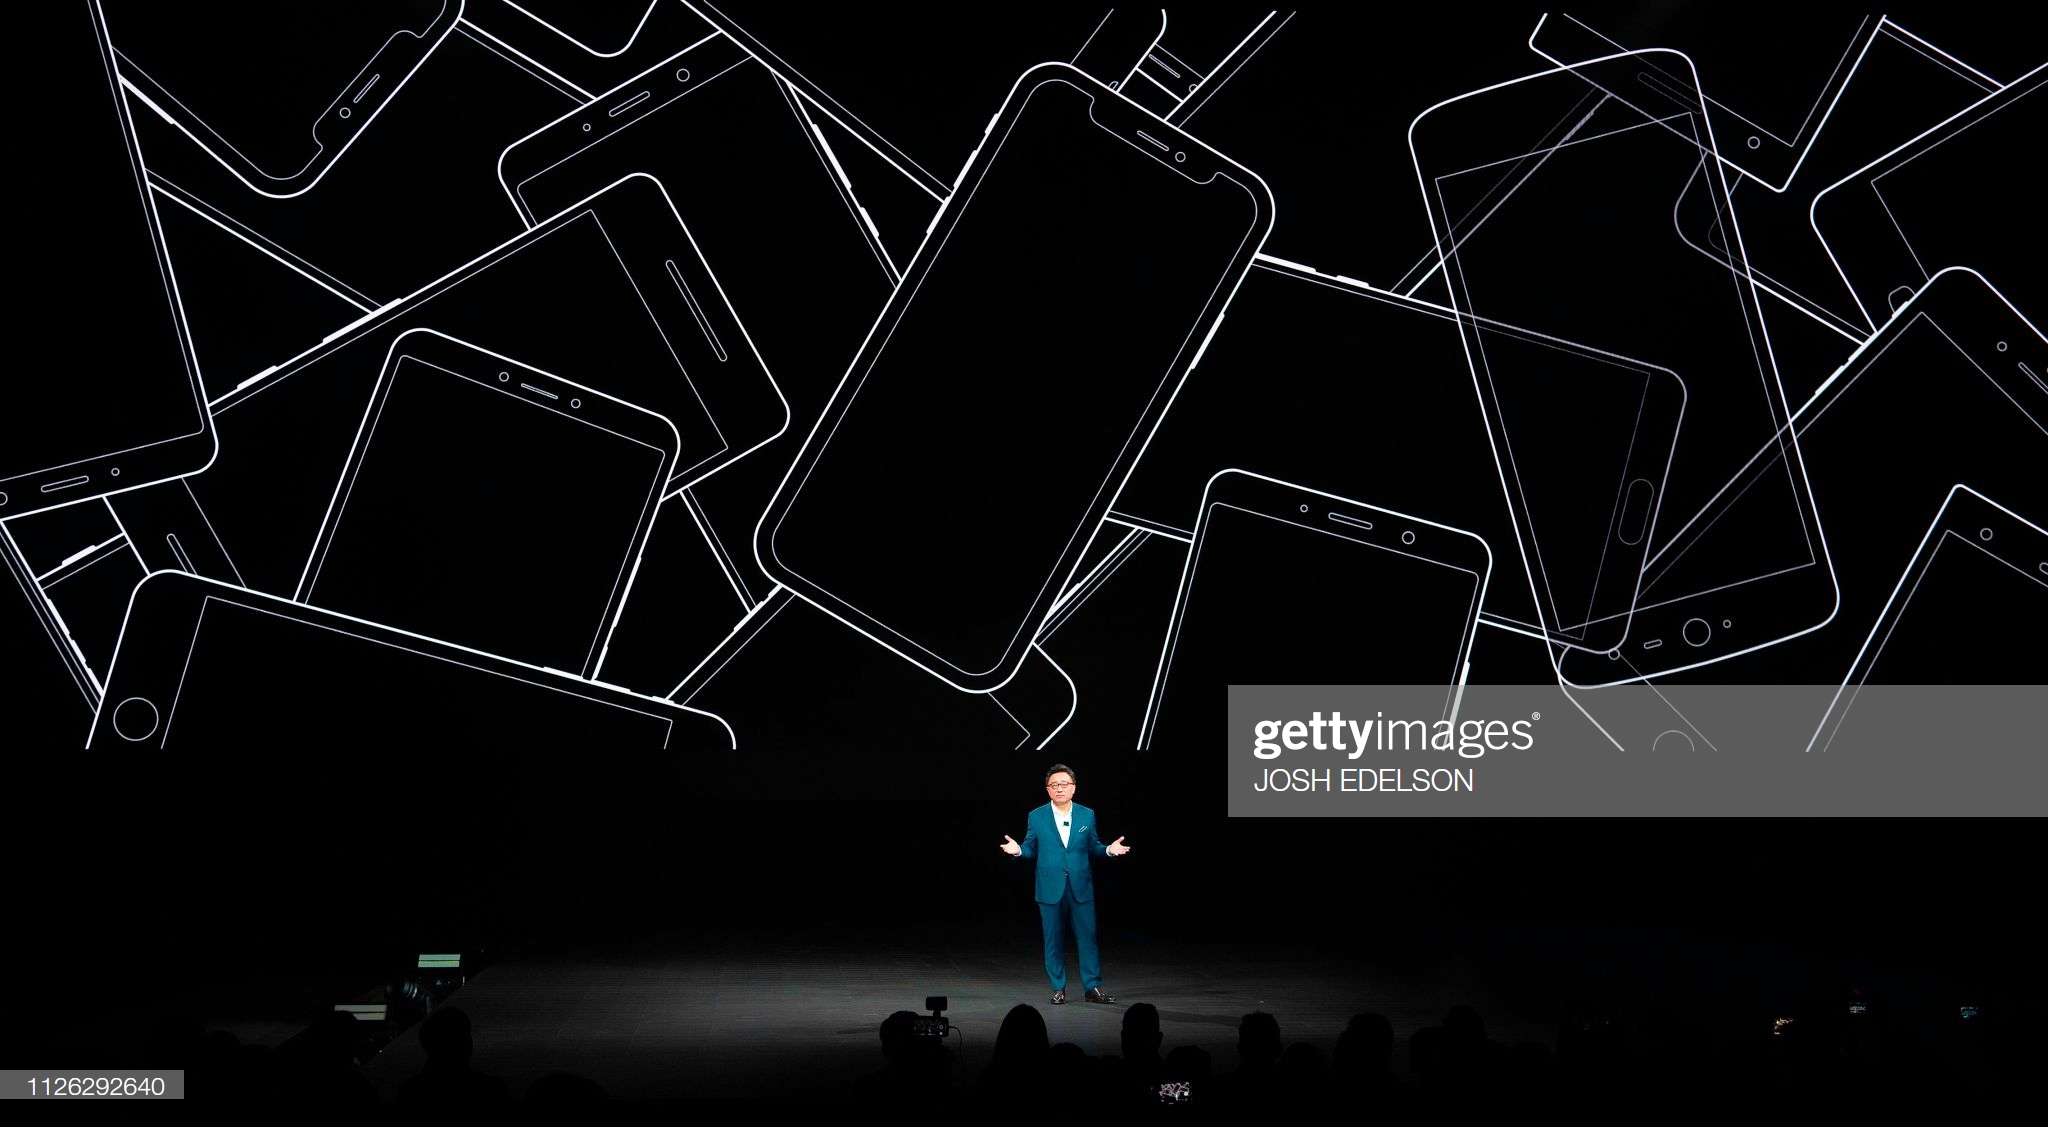 Indicators fall: Samsung is losing market position